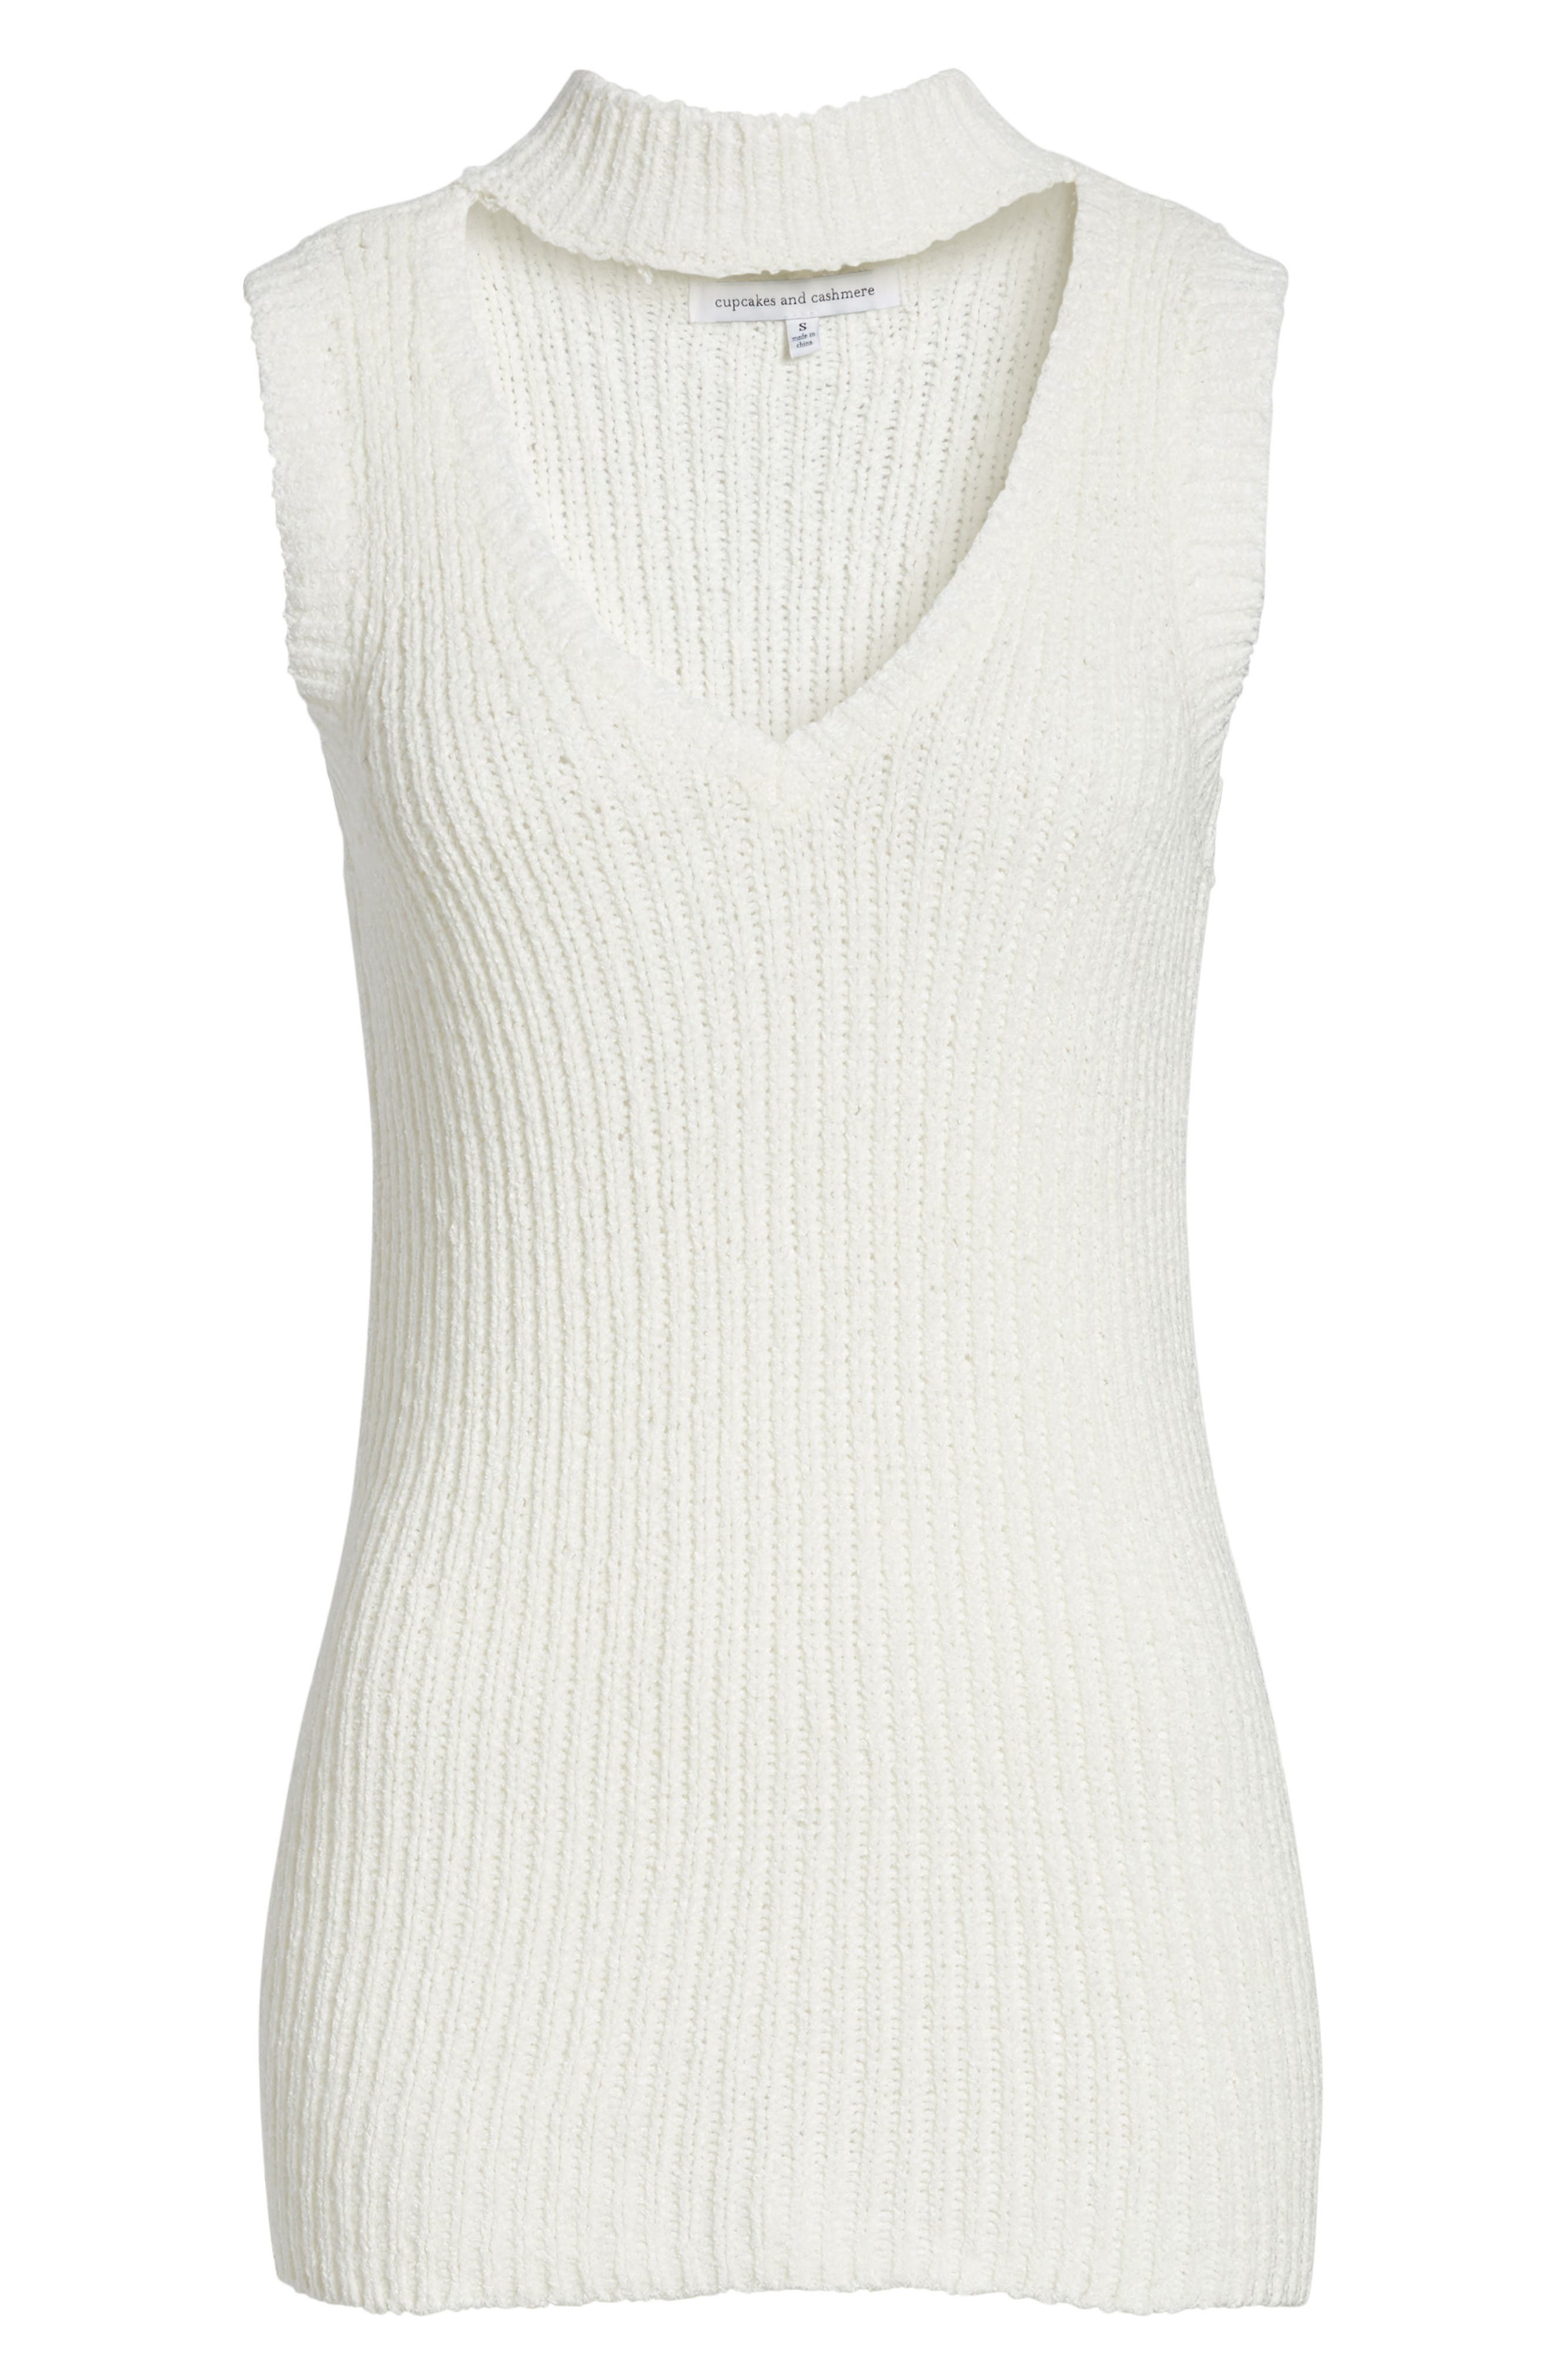 Camdon Sleeveless Sweater,                             Alternate thumbnail 7, color,                             Ivory